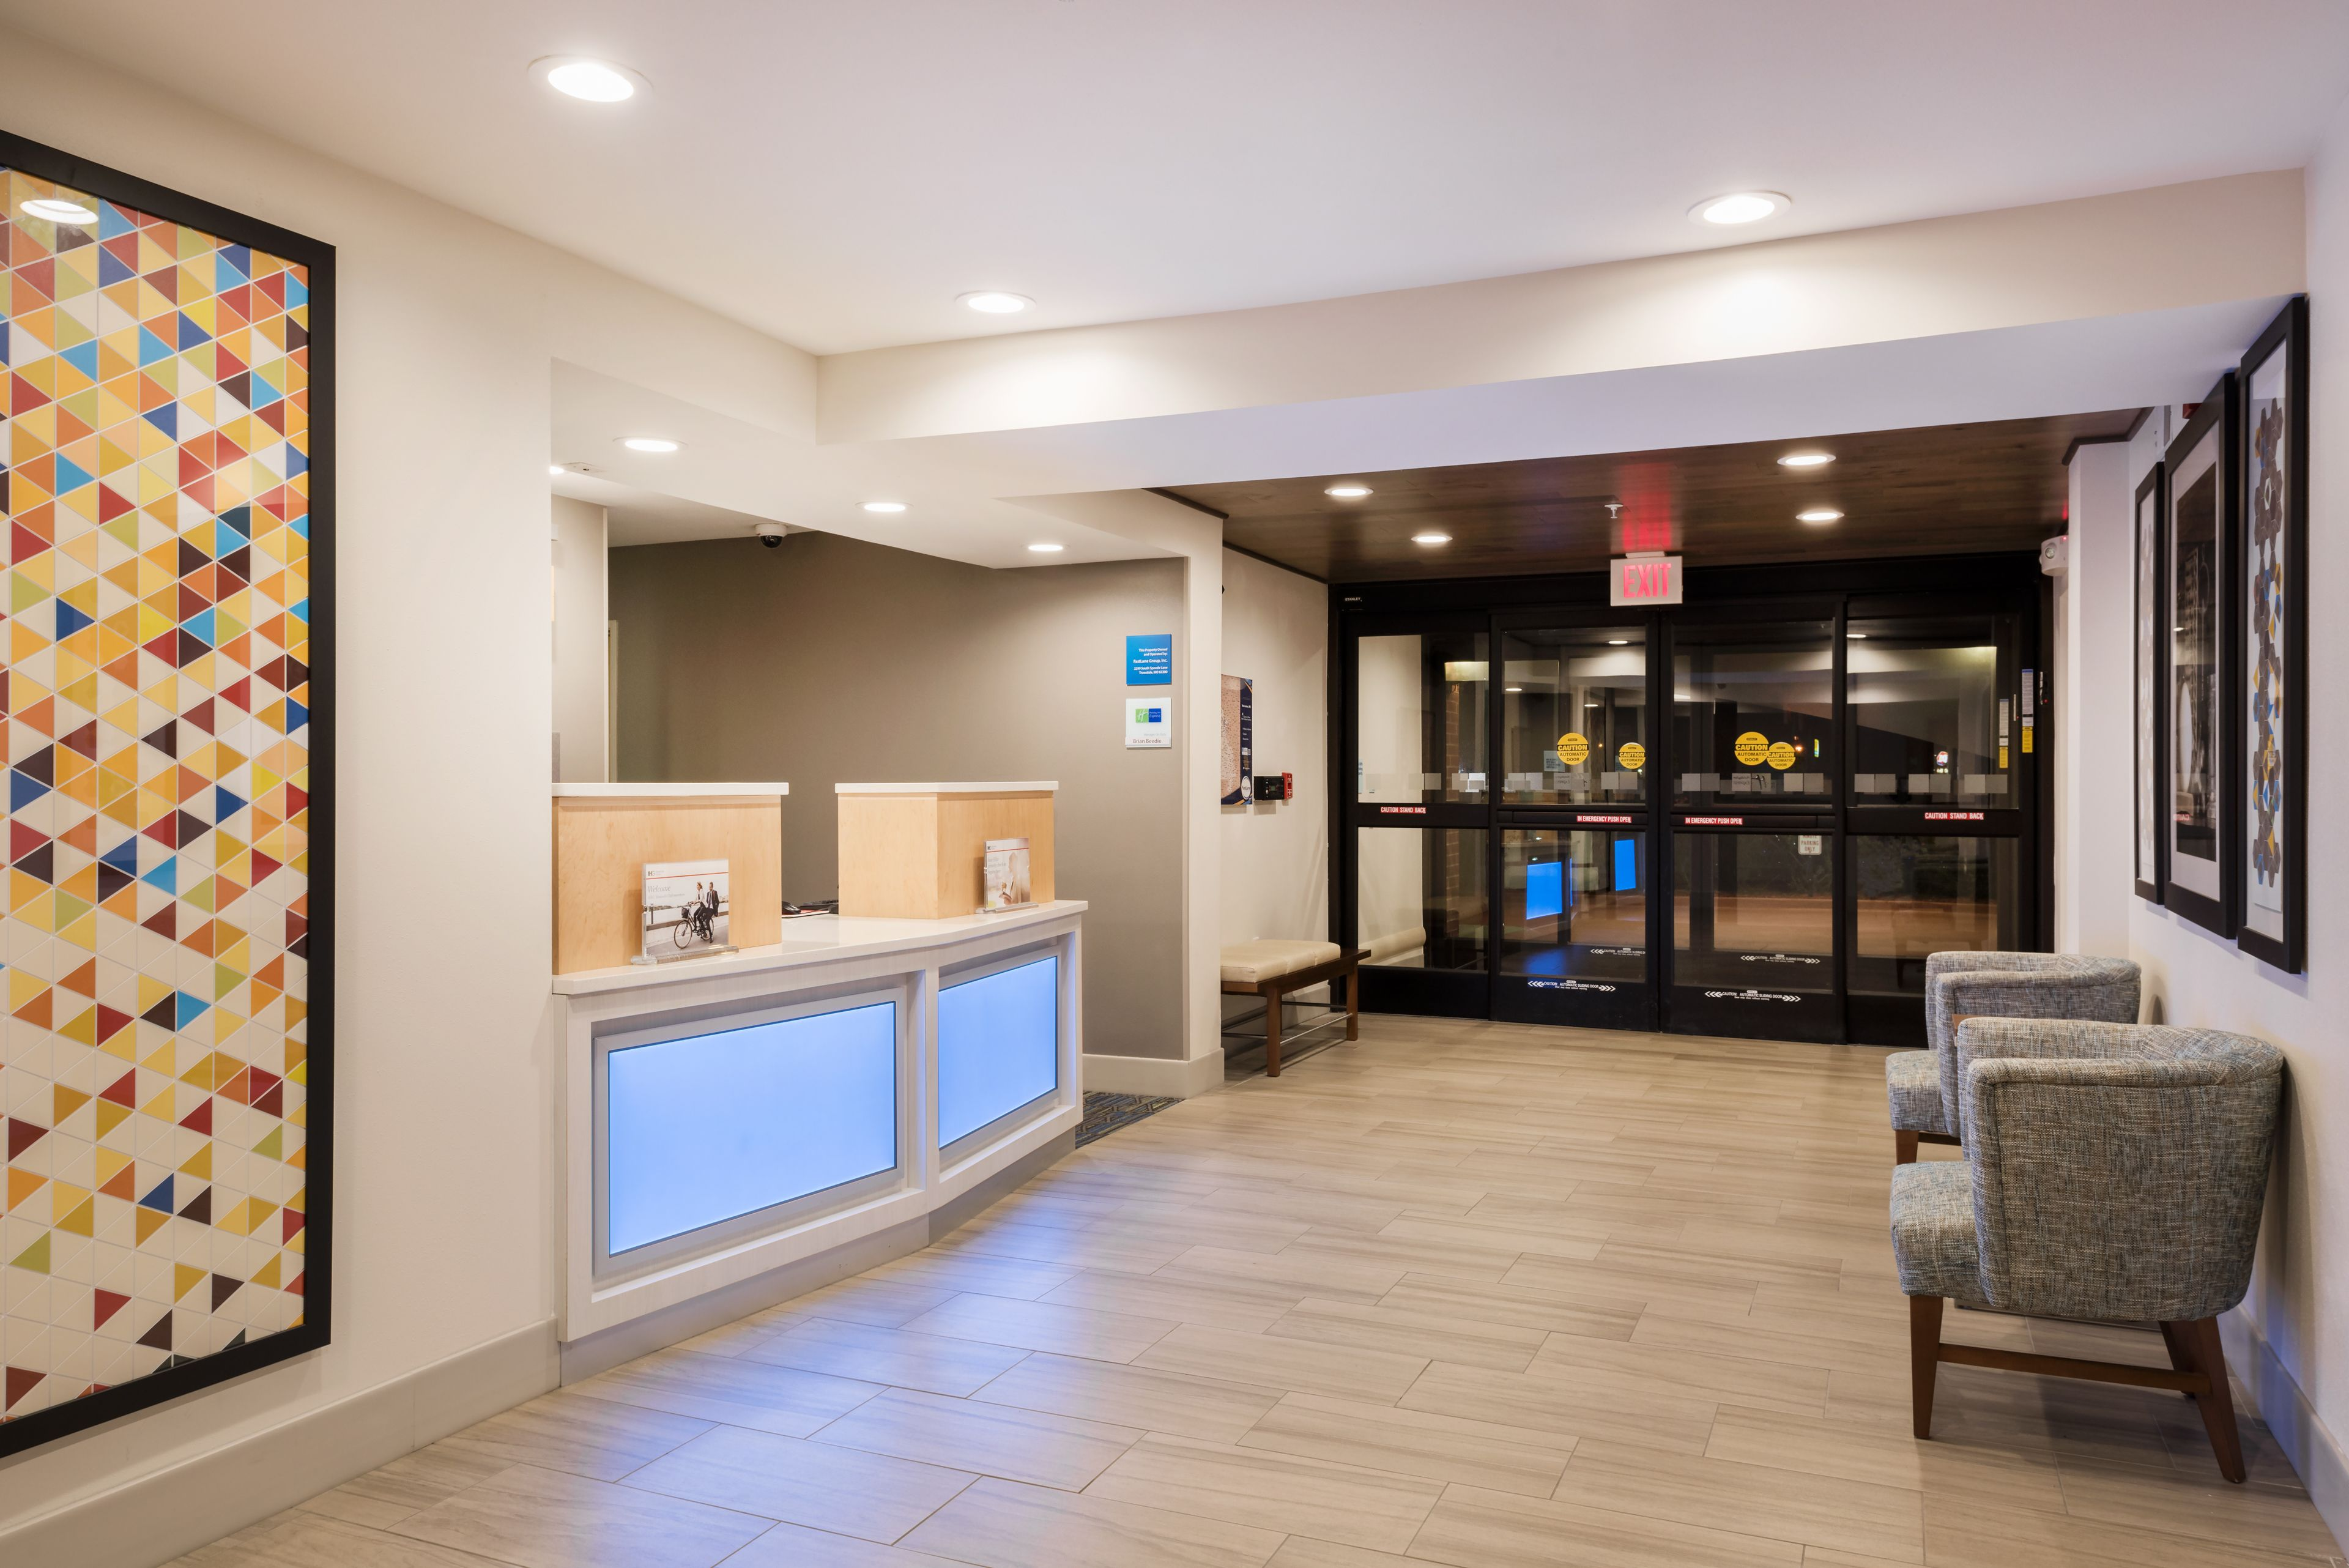 holiday inn express warrenton in warrenton mo hotels. Black Bedroom Furniture Sets. Home Design Ideas